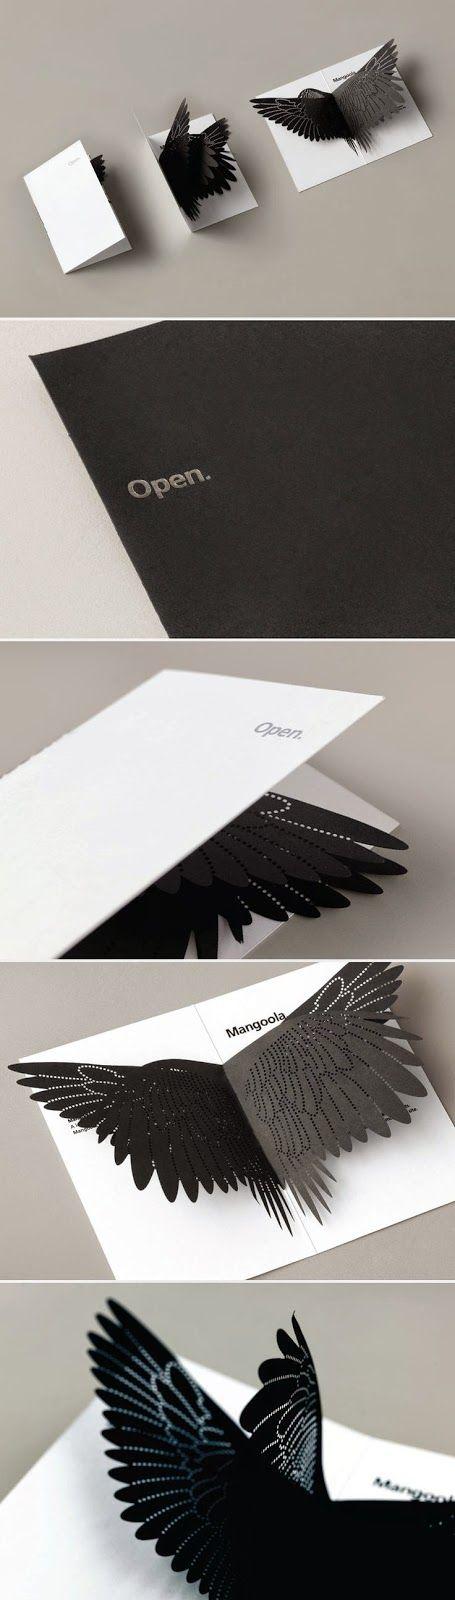 Mangoola Coal<<< angel wings anybody?